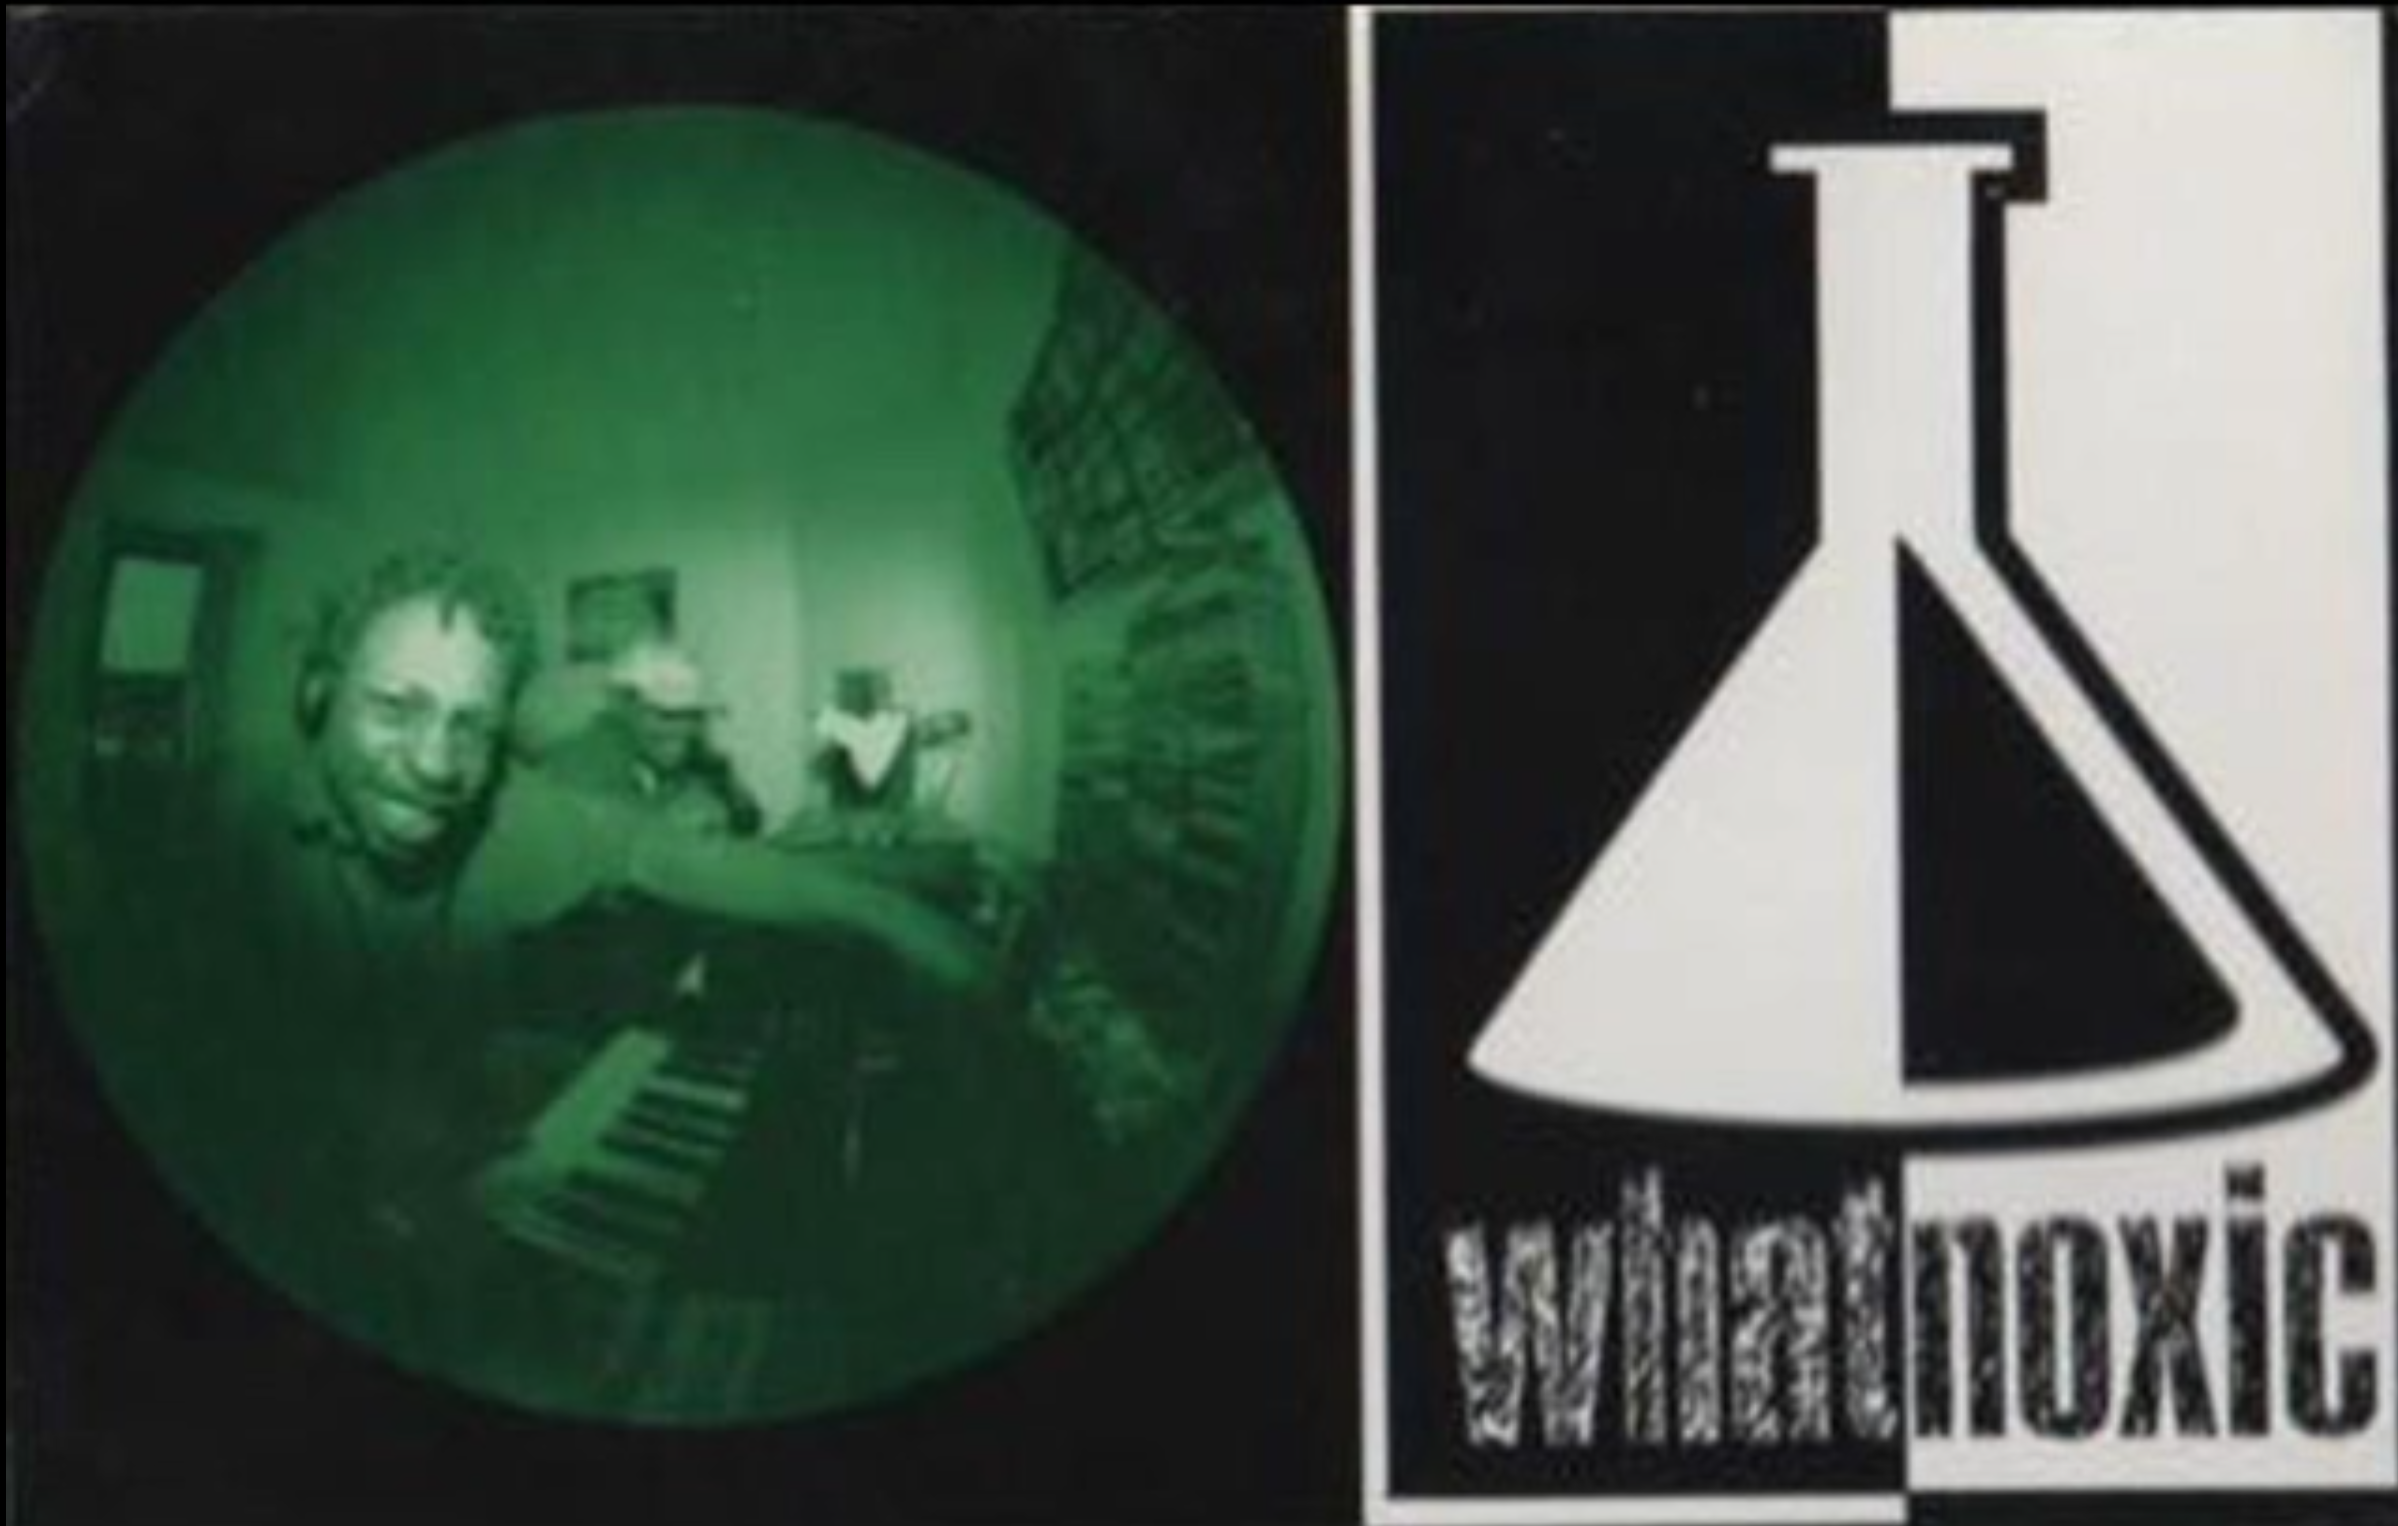 Whatnoxic Cassette Artwork